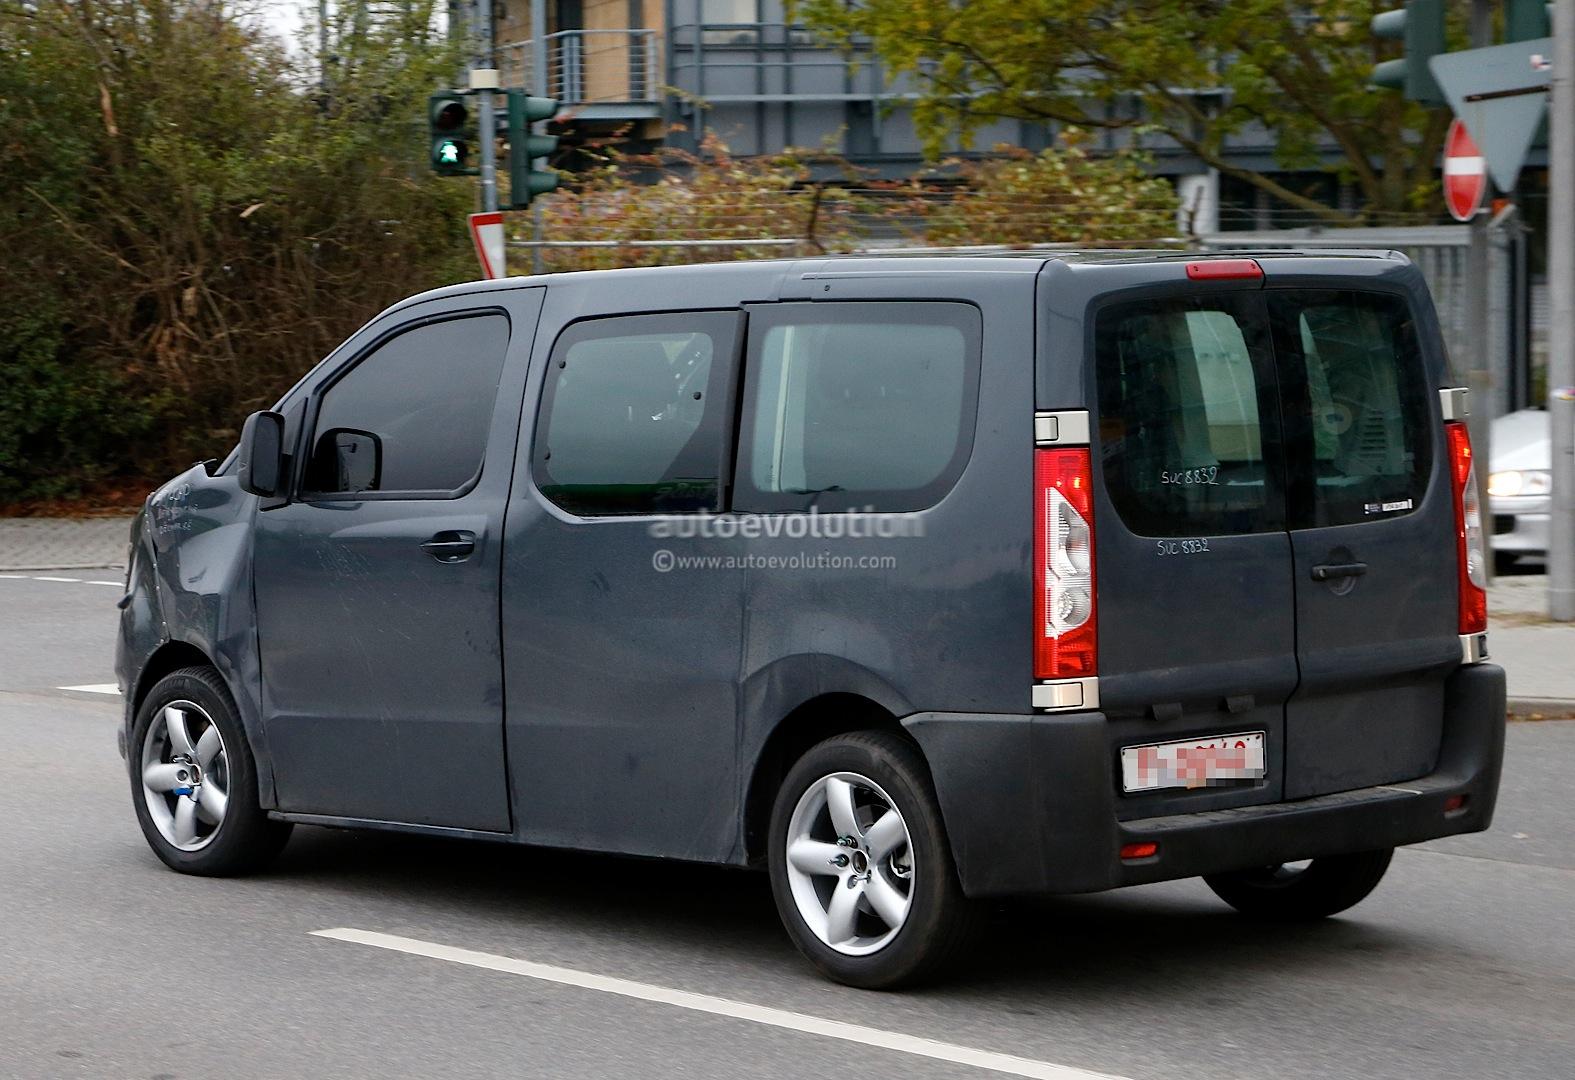 2016 - [Citroën/Peugeot/Toyota] SpaceTourer/Traveller/ProAce Spyshots-new-citroen-jumpy-takes-cues-from-2011-tubik-concept-1080p-6